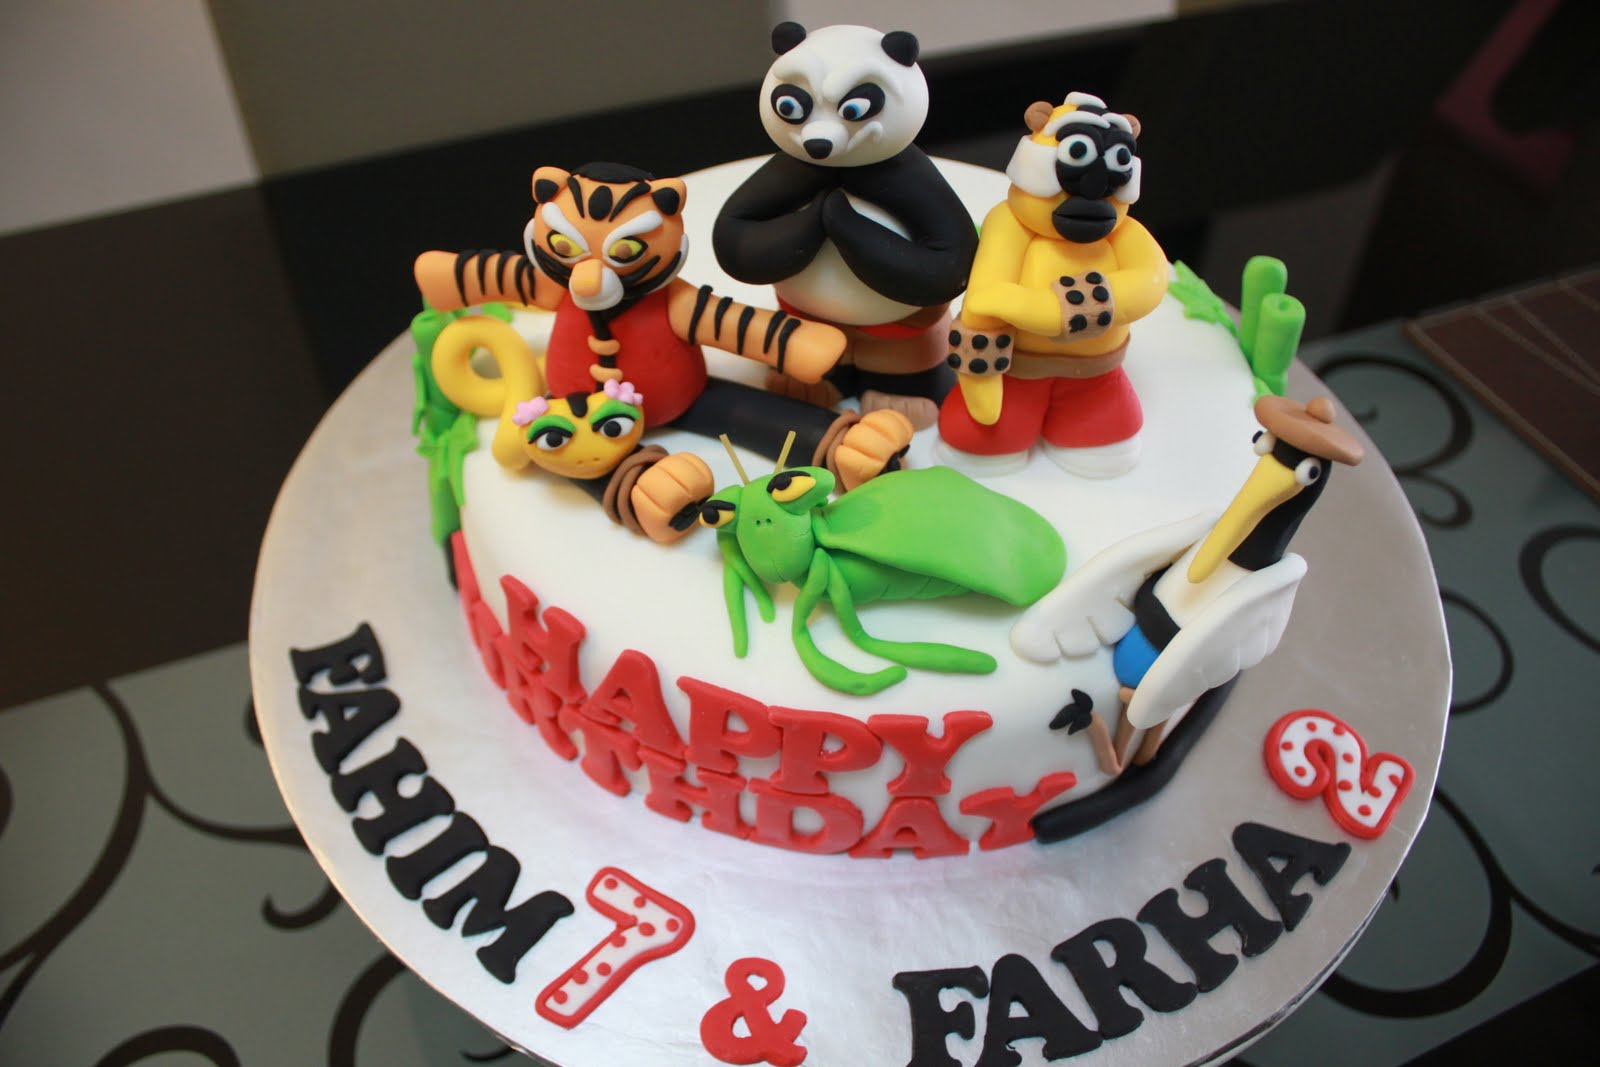 Comelicious Kung Fu Panda Cake